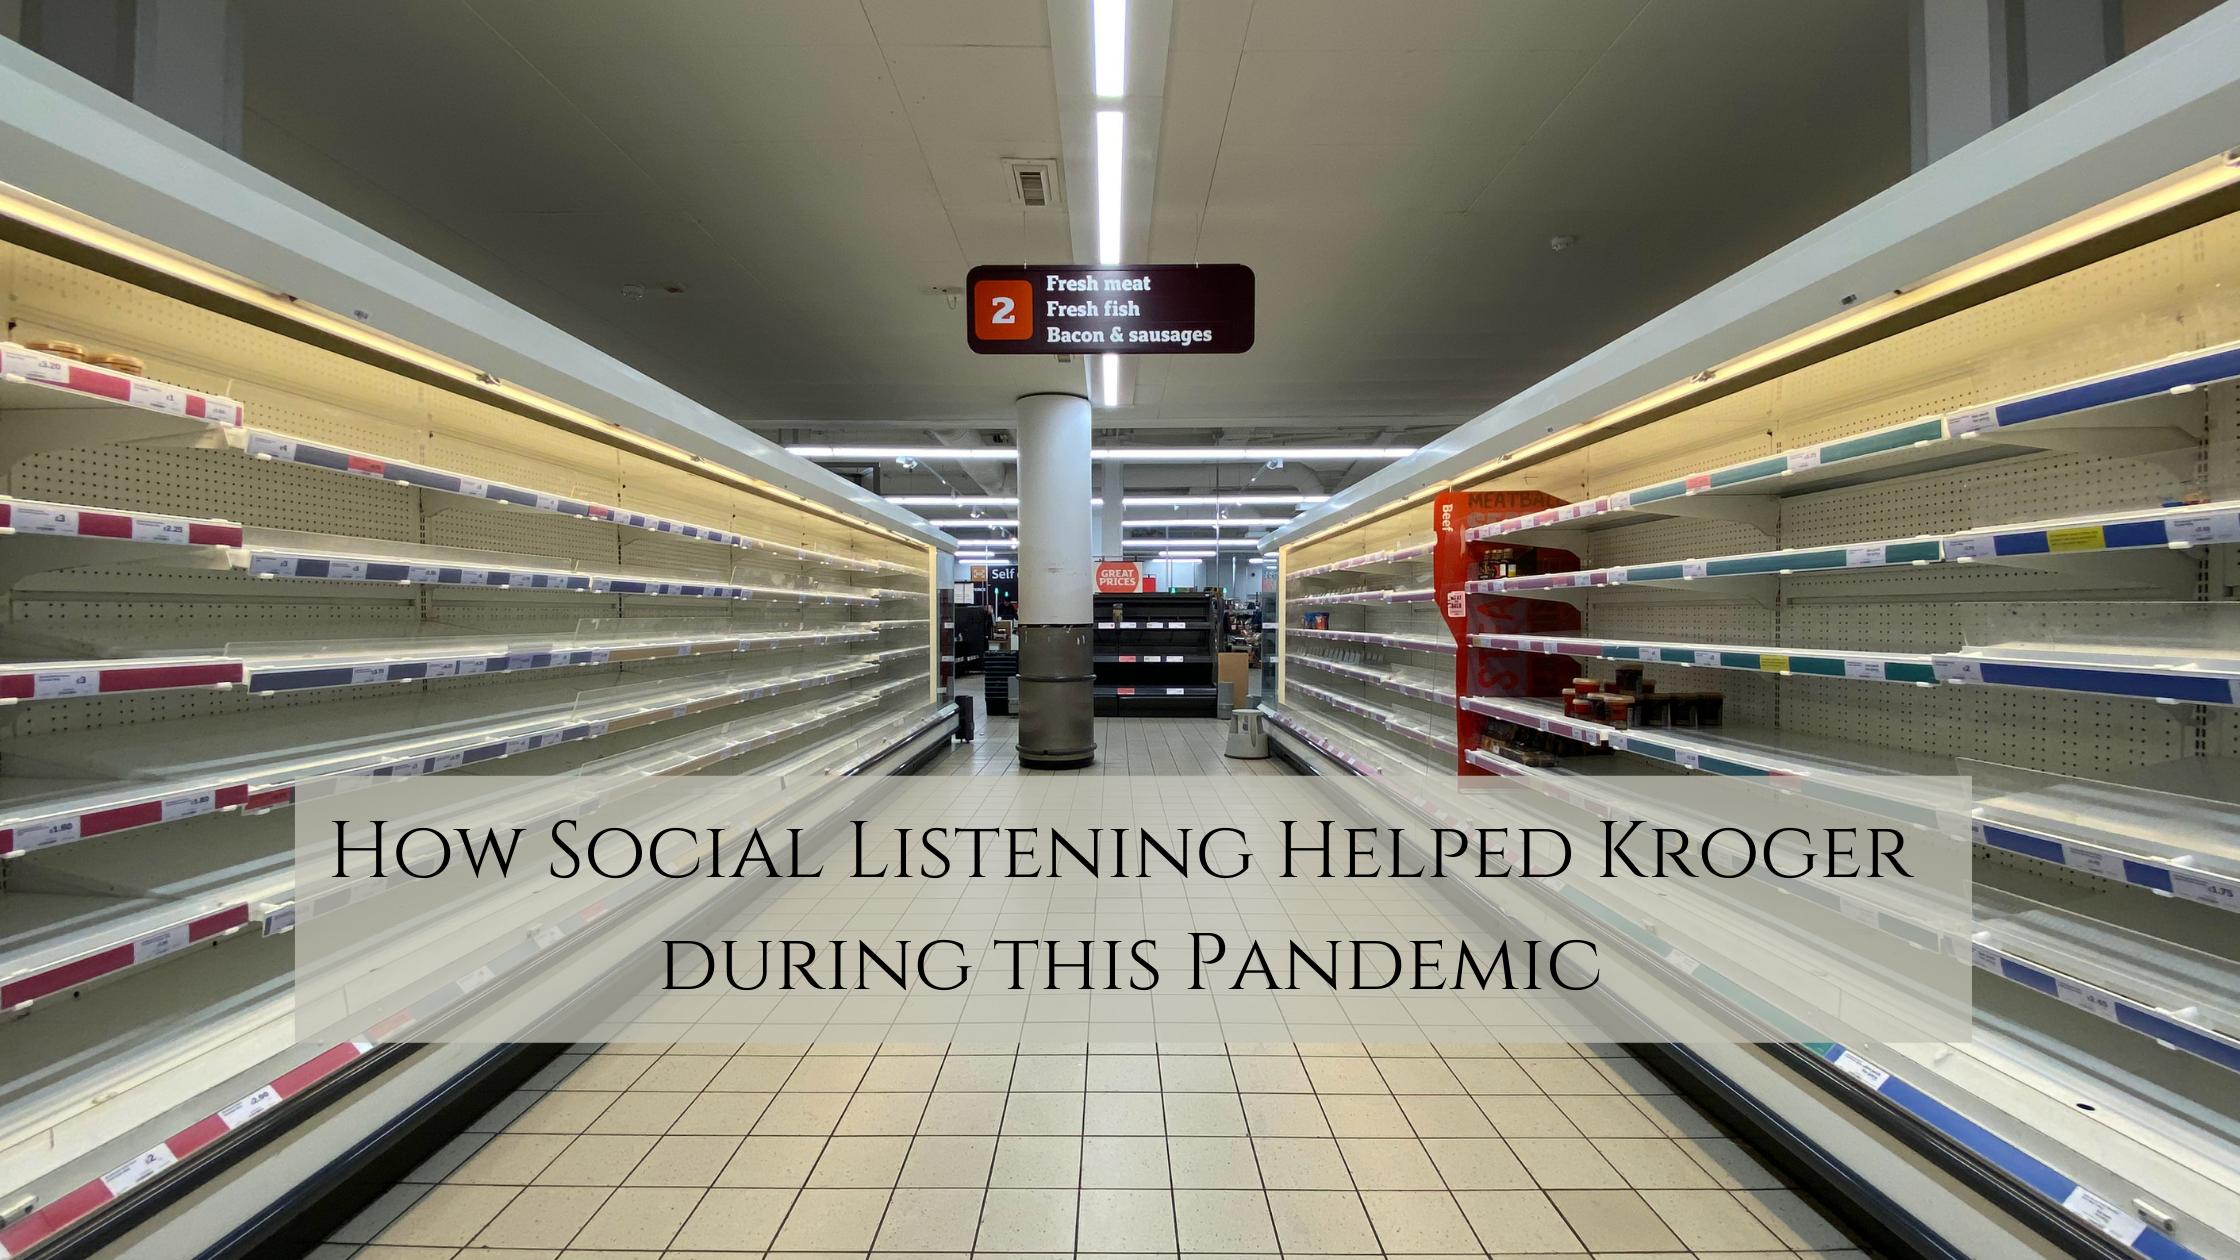 Social Listening Helped Kroger during Pandemic